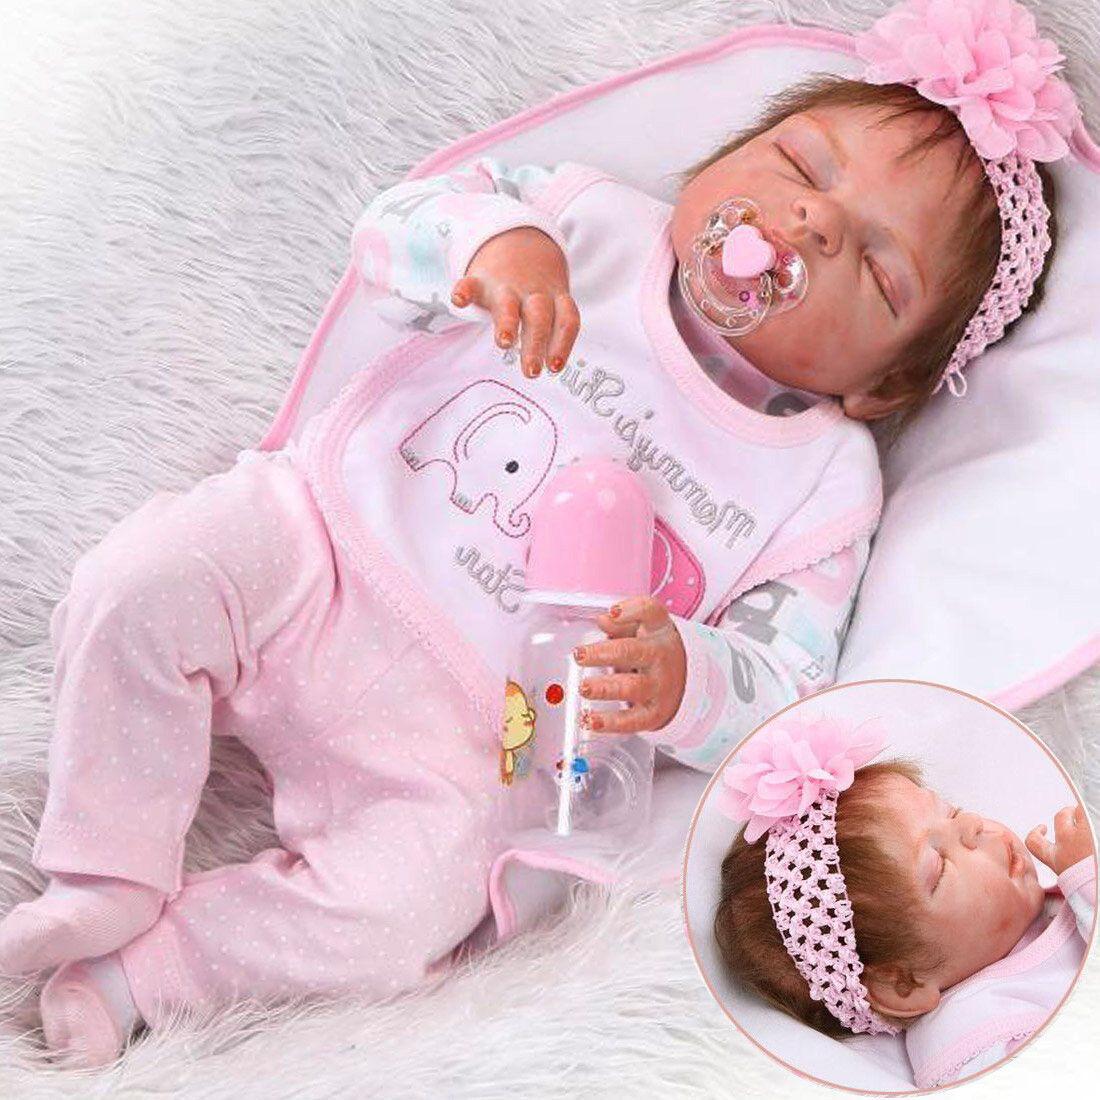 22CM Full Body Silicone Vinyl Newborn Lifelike Handmade Reborn Baby Girl Doll US